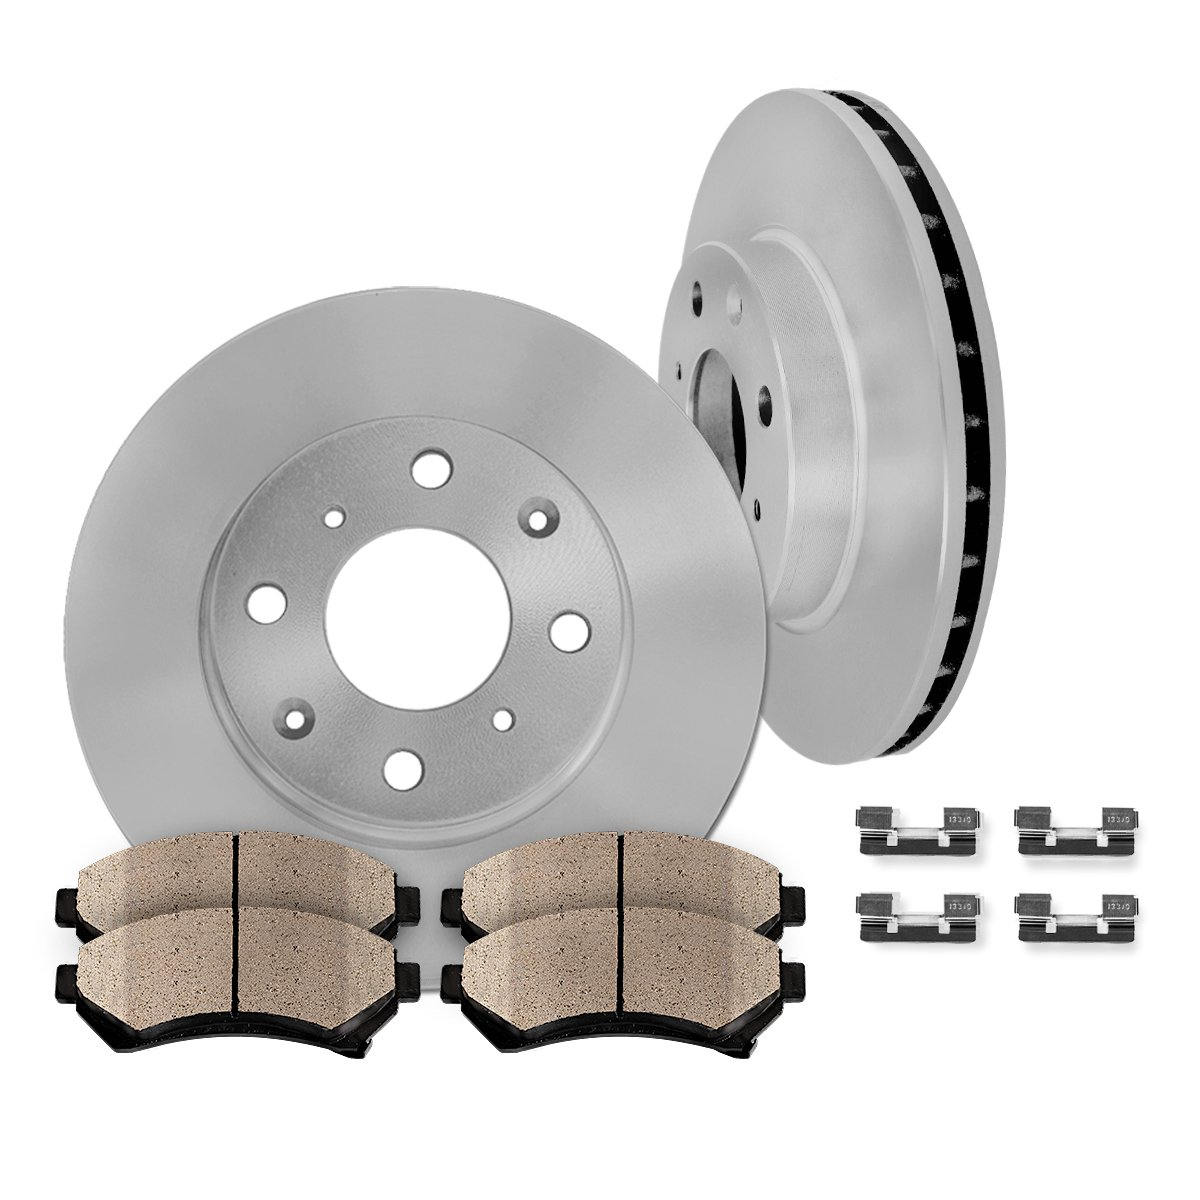 FRONT 255 mm Premium OE 4 Lug [2] Brake Disc Rotors + [4] Ceramic Brake Pads + Clips by Callahan Brake Parts